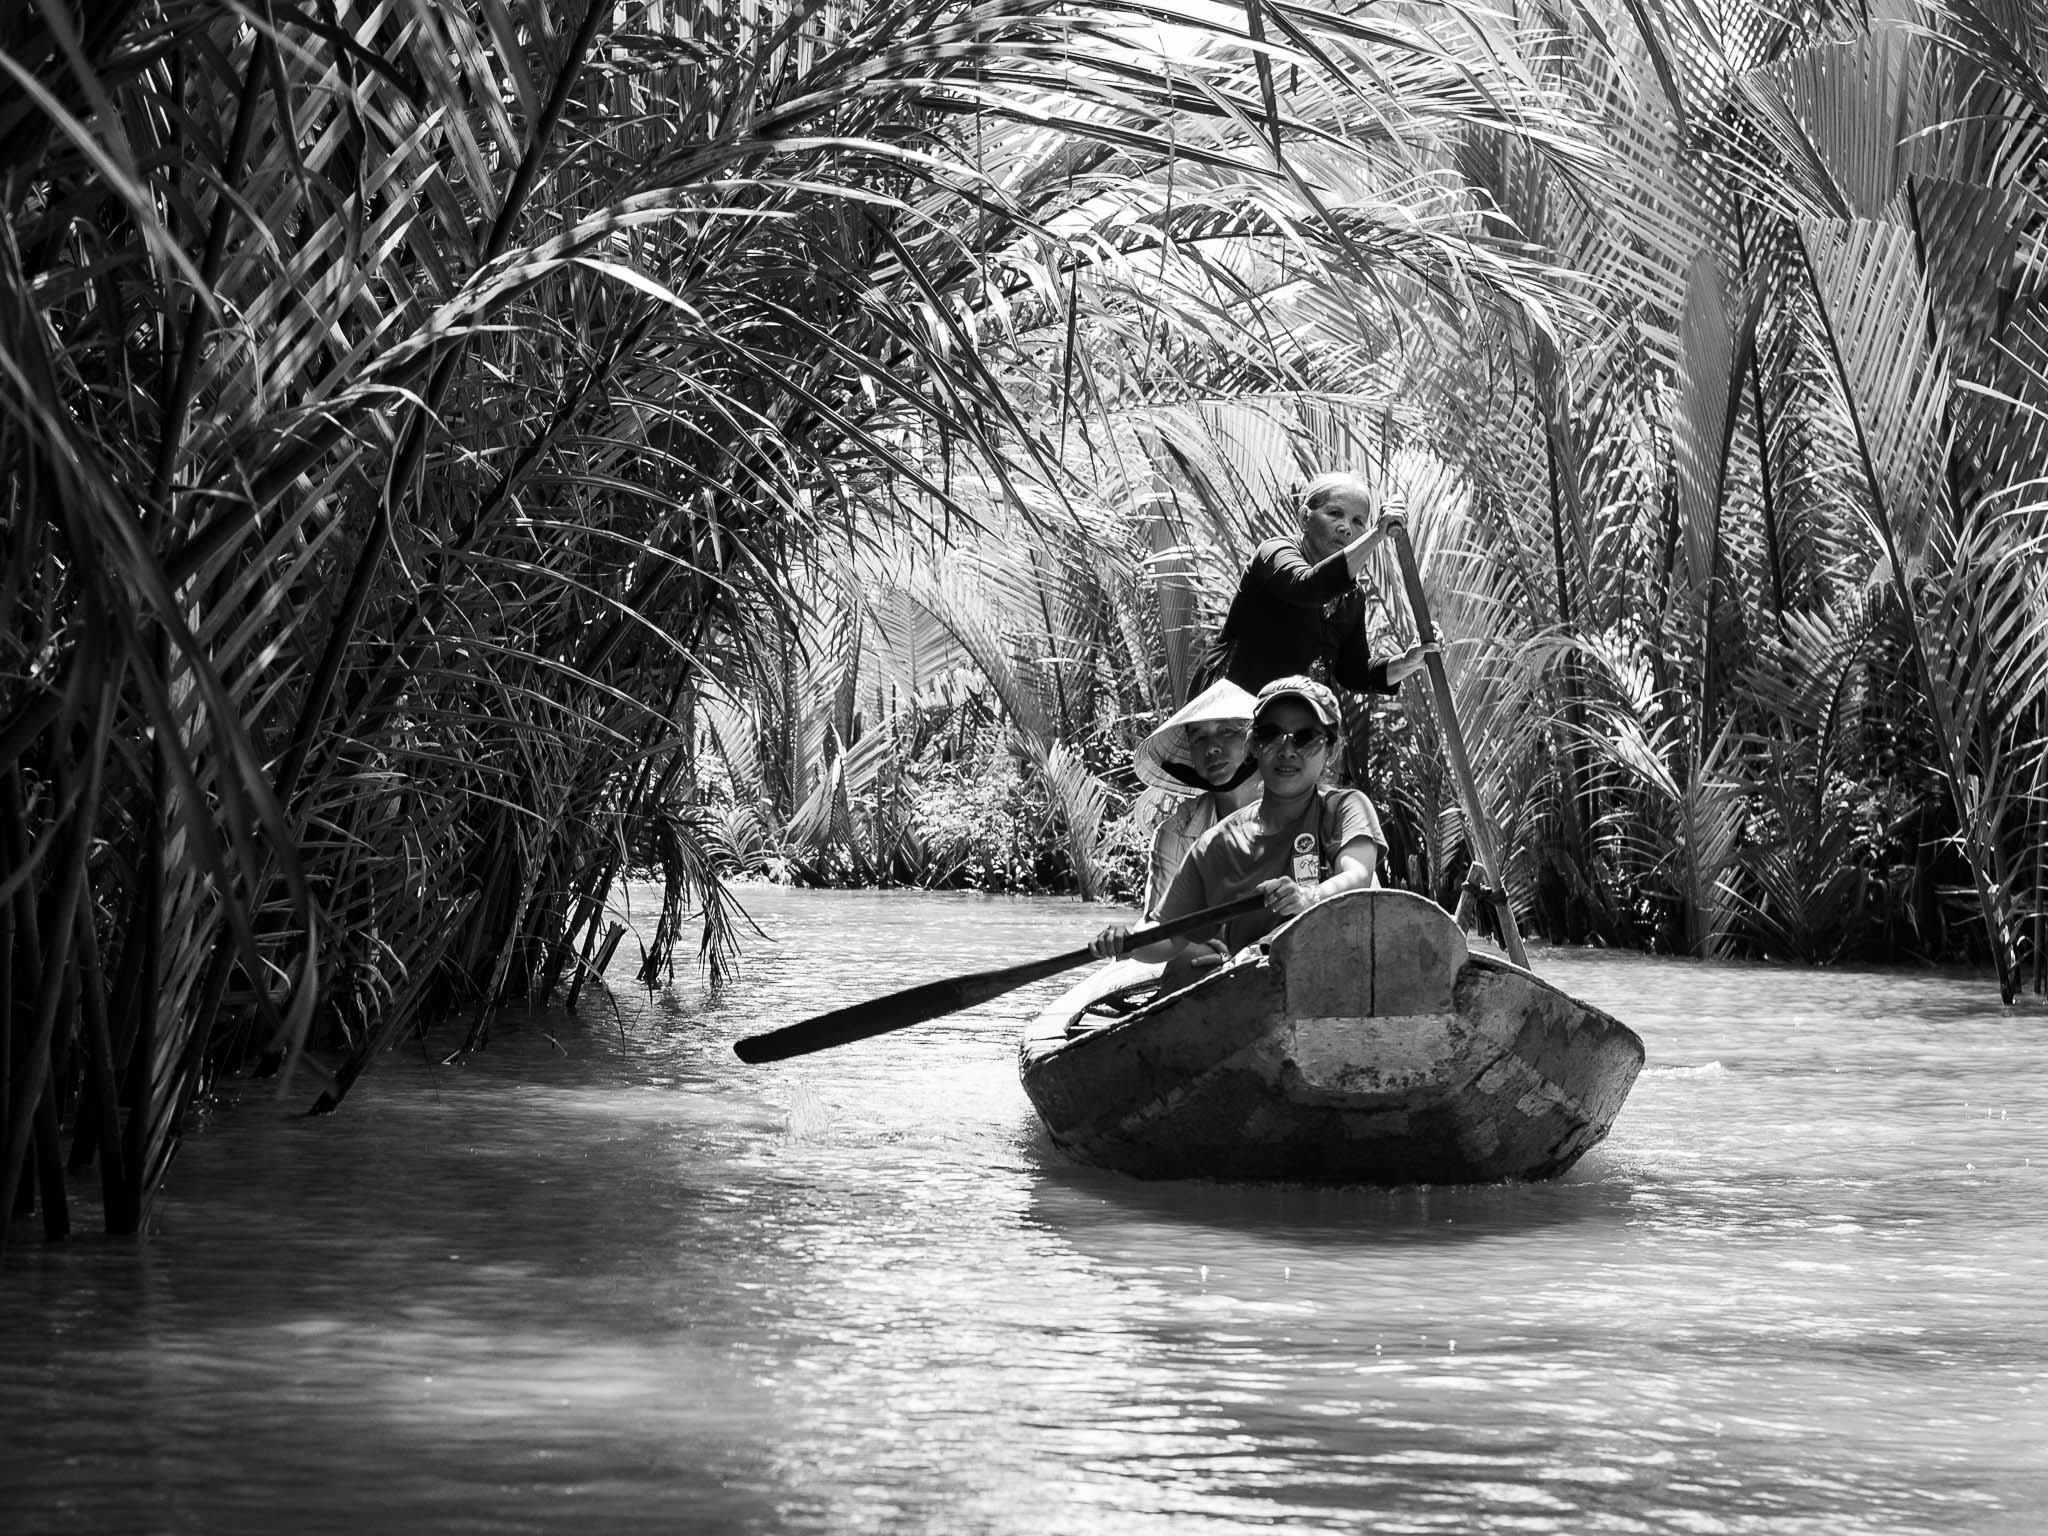 Vietnam Rural Street Photography